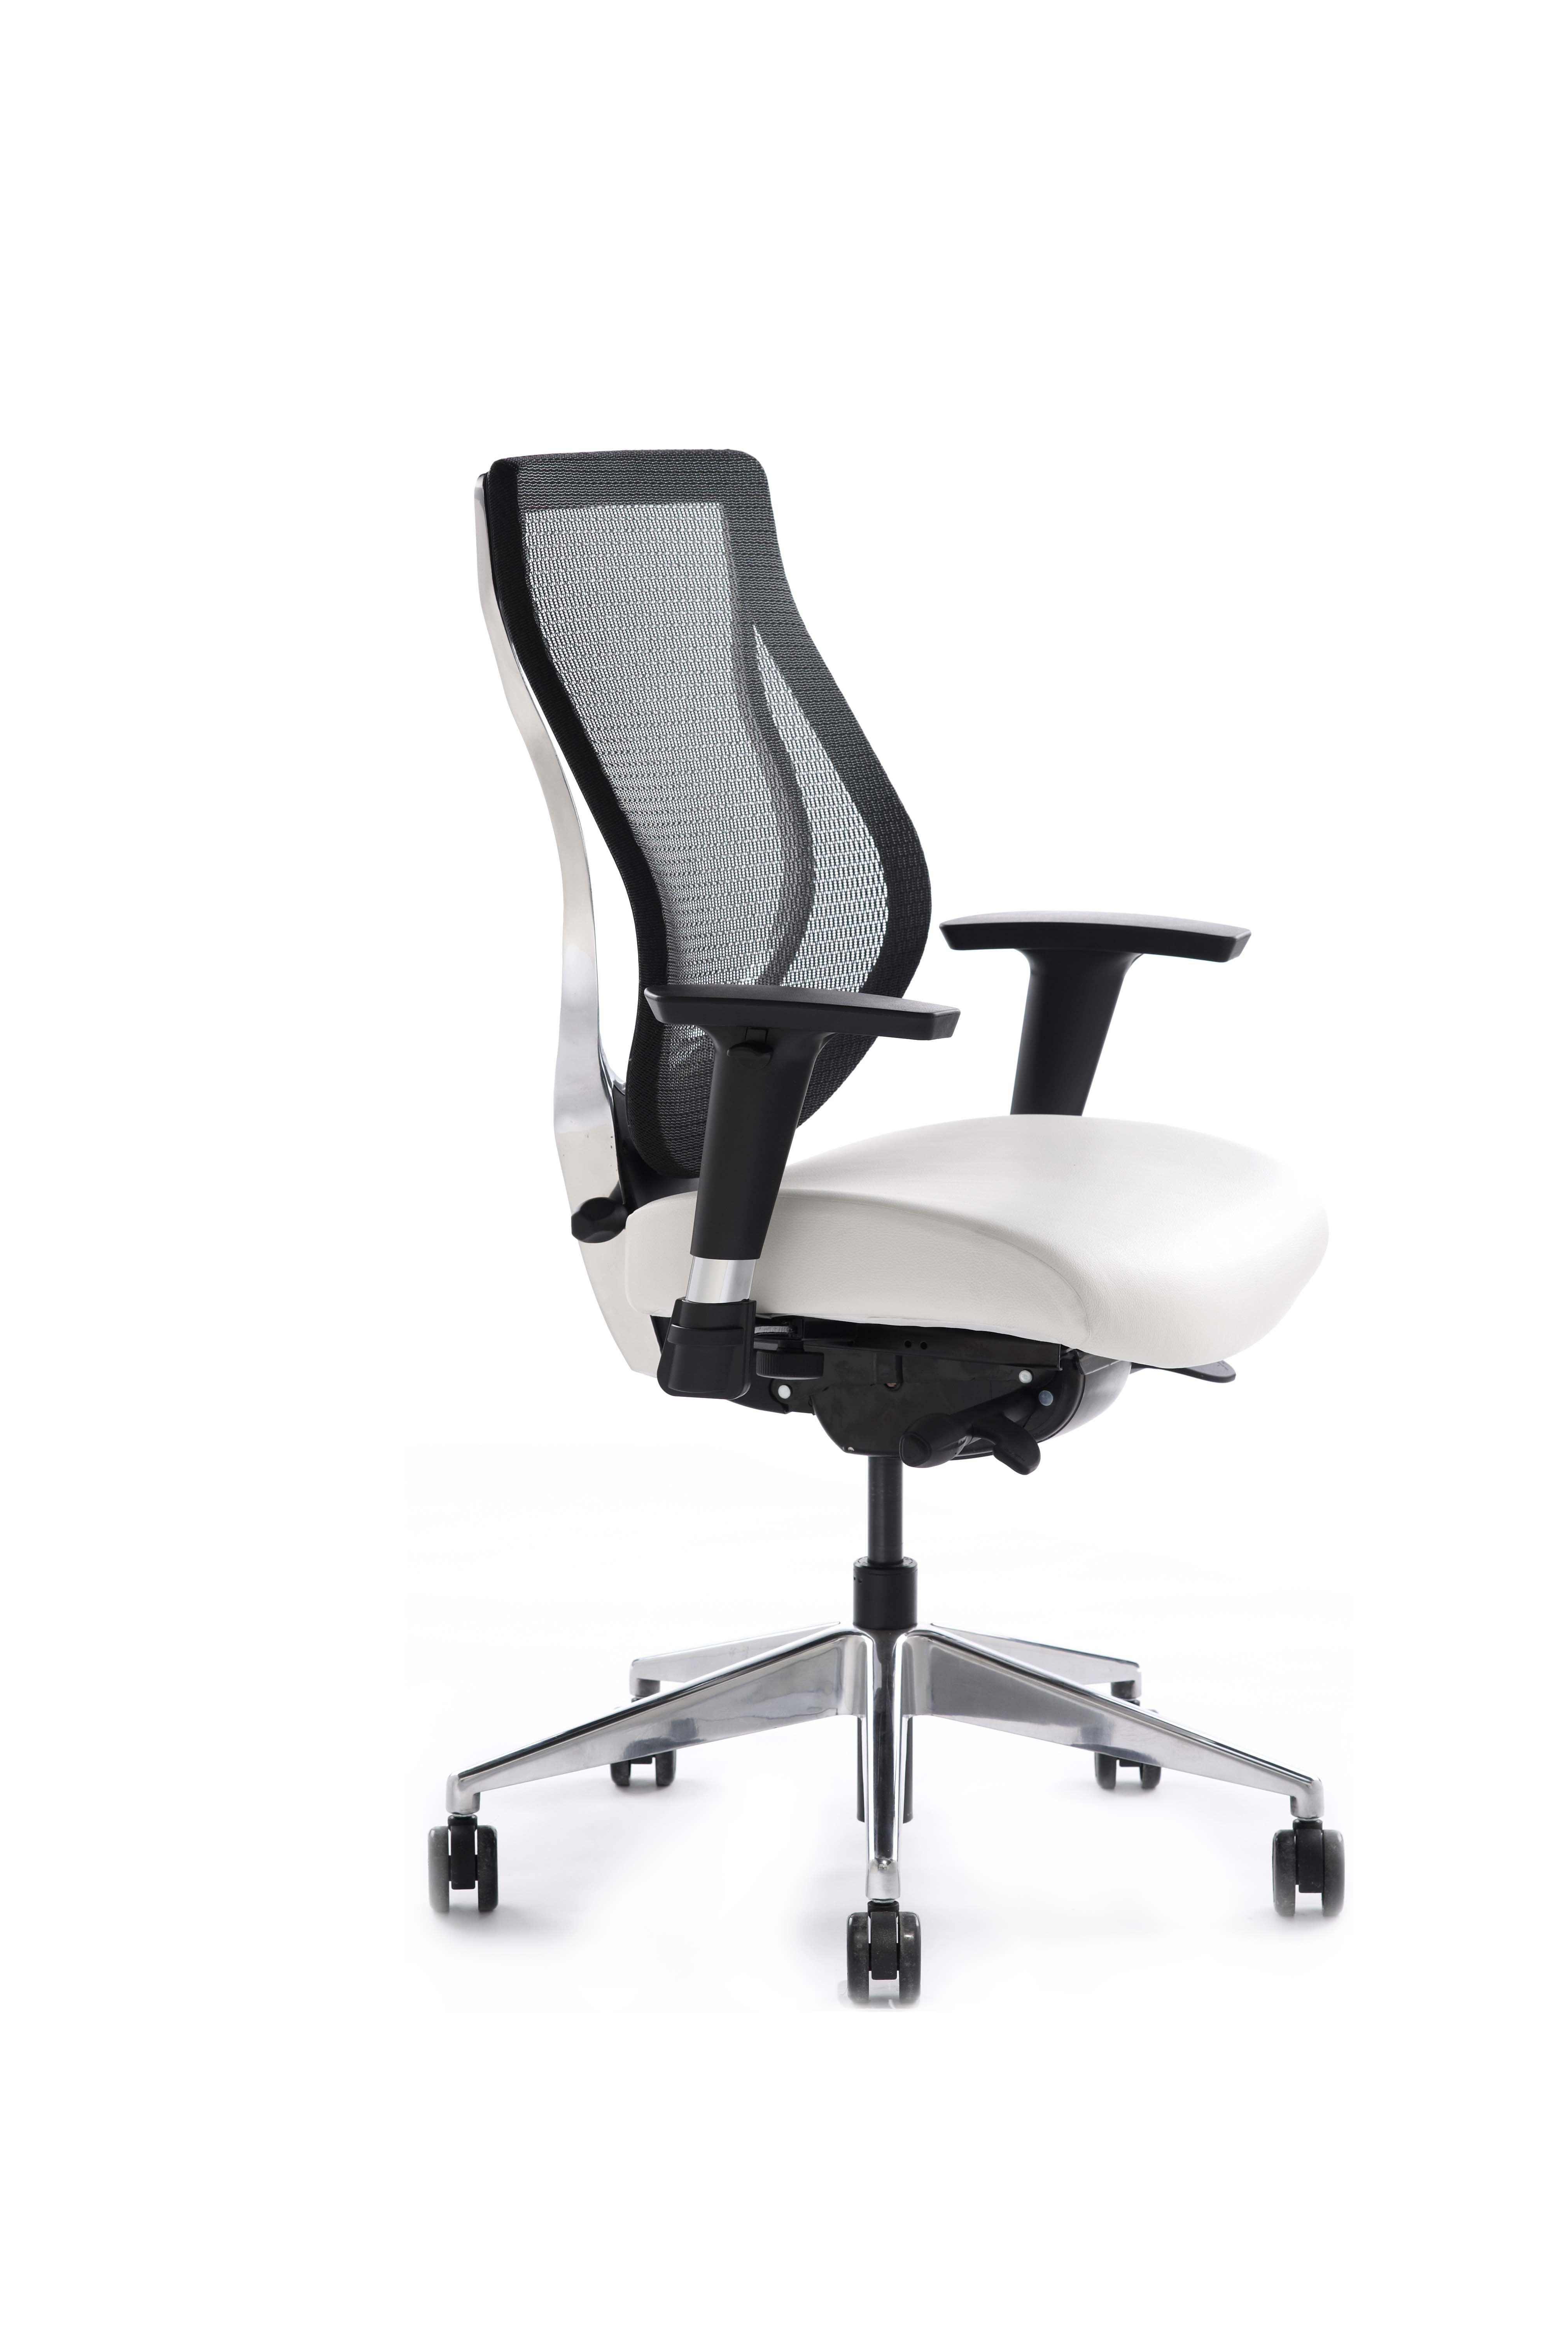 Allseating You Task Chair designcorporatedesigninteriors